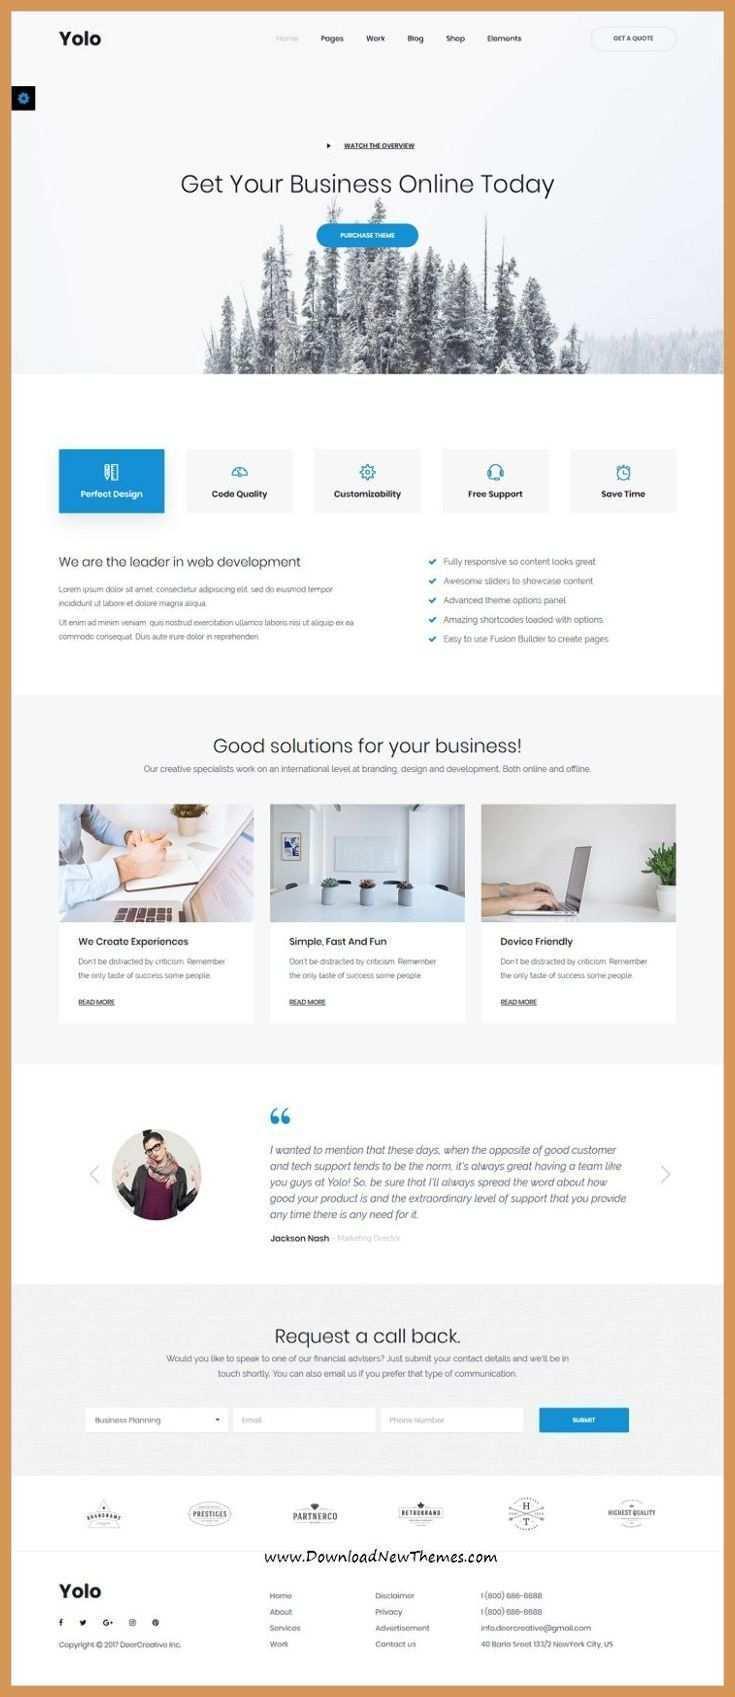 Responsive Web Design Boostrap Yolo Ist Ein Sauberes Und Modernes Design Responsive Multipurpose Bo Yol In 2020 Webdesign Angebote Web Design Screendesign